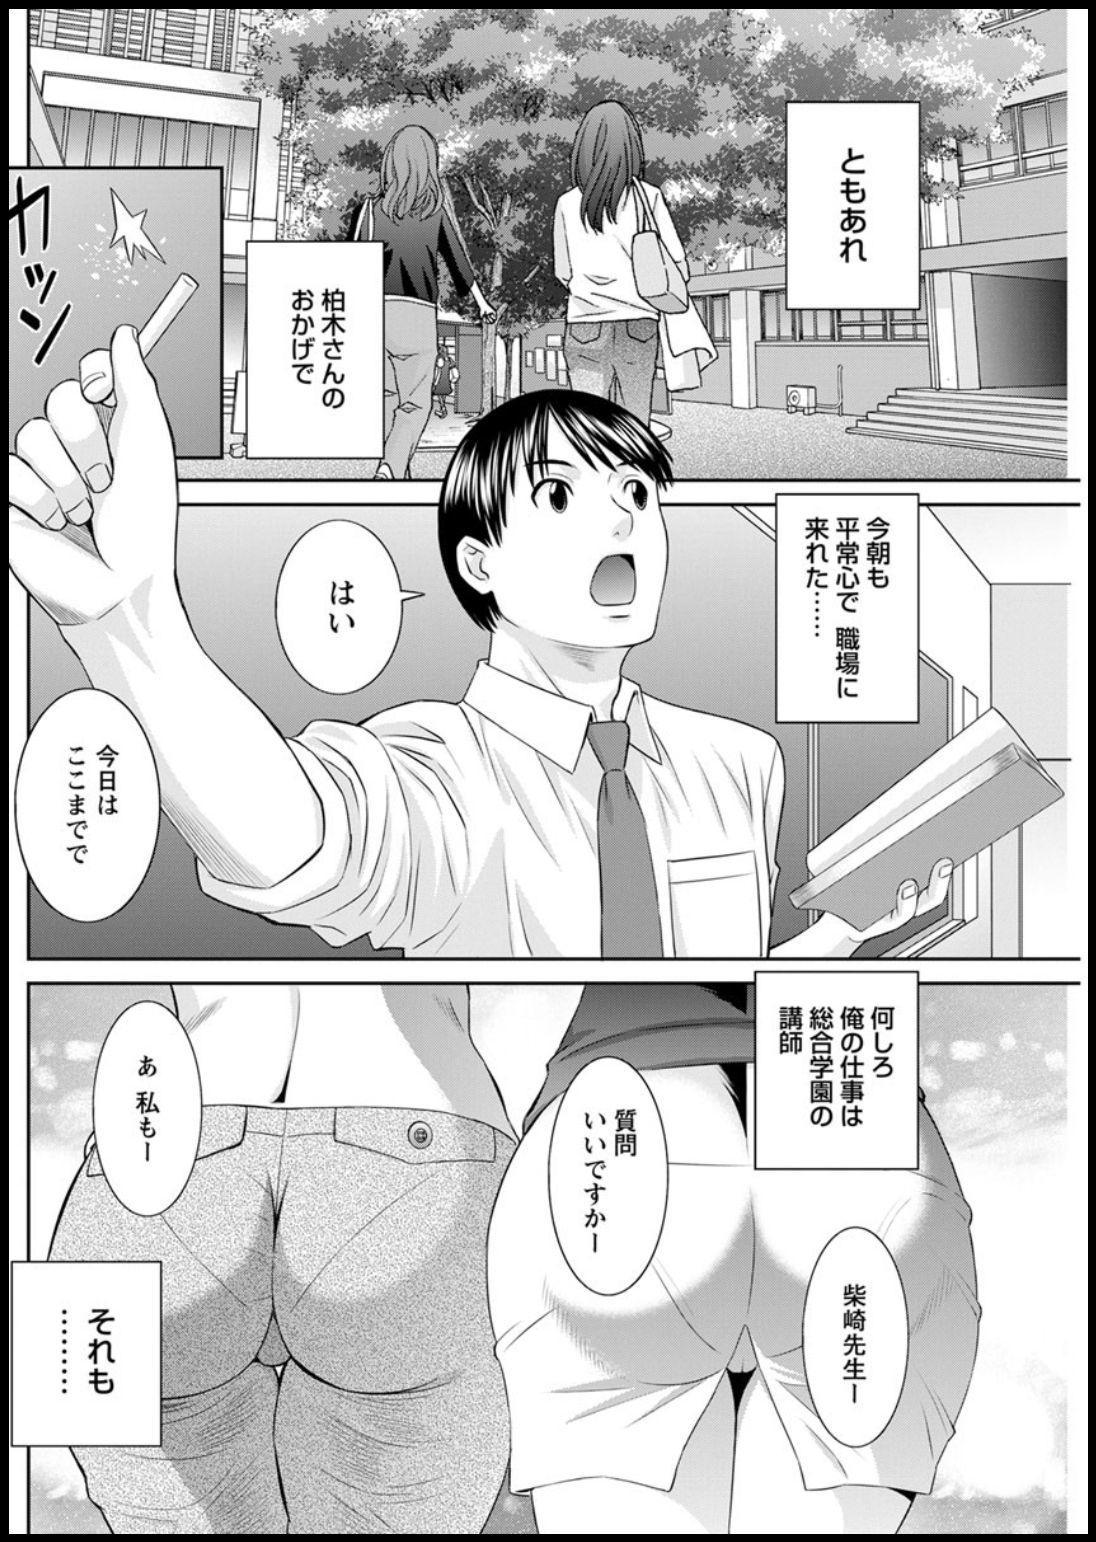 [Kawamori Misaki] Kaikan Hitotsuma Gakuen Ch. 1-6, 8-16 [Digital] 171